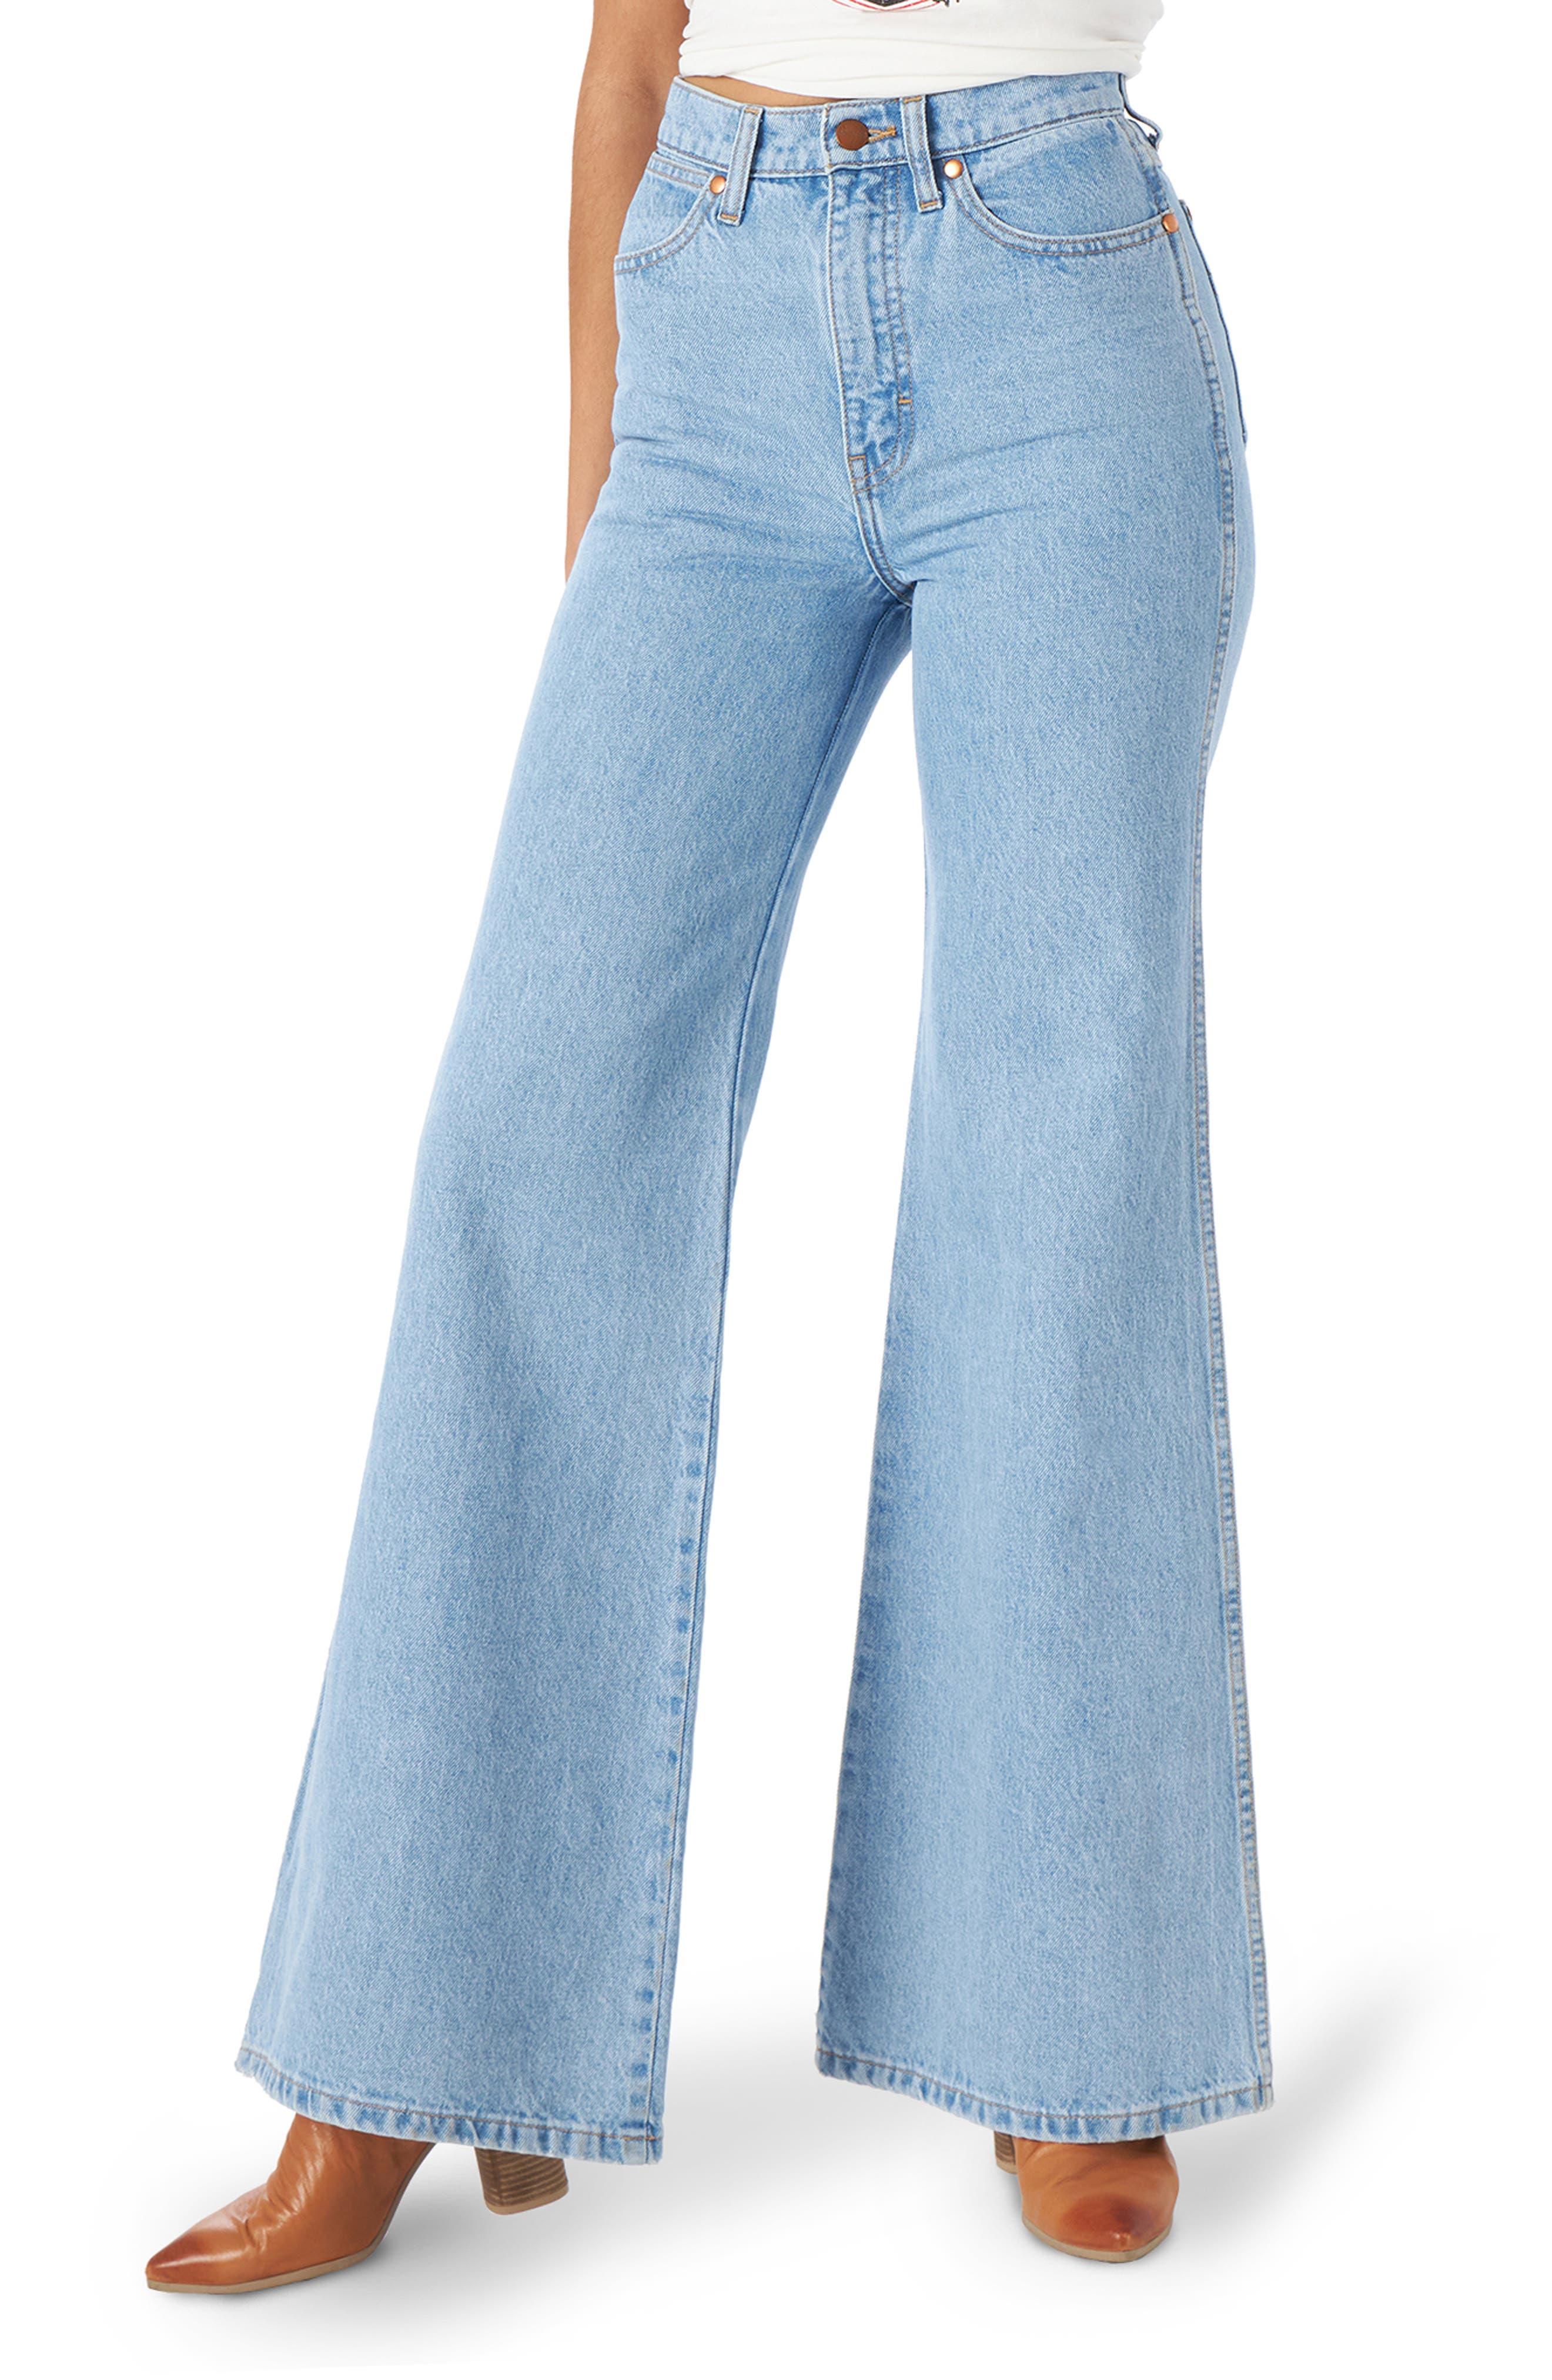 MAGNA-Superposé überweite Pantalon//Pantalon Jupe Taille 44 46 48 50 52 54 56 58-Olive